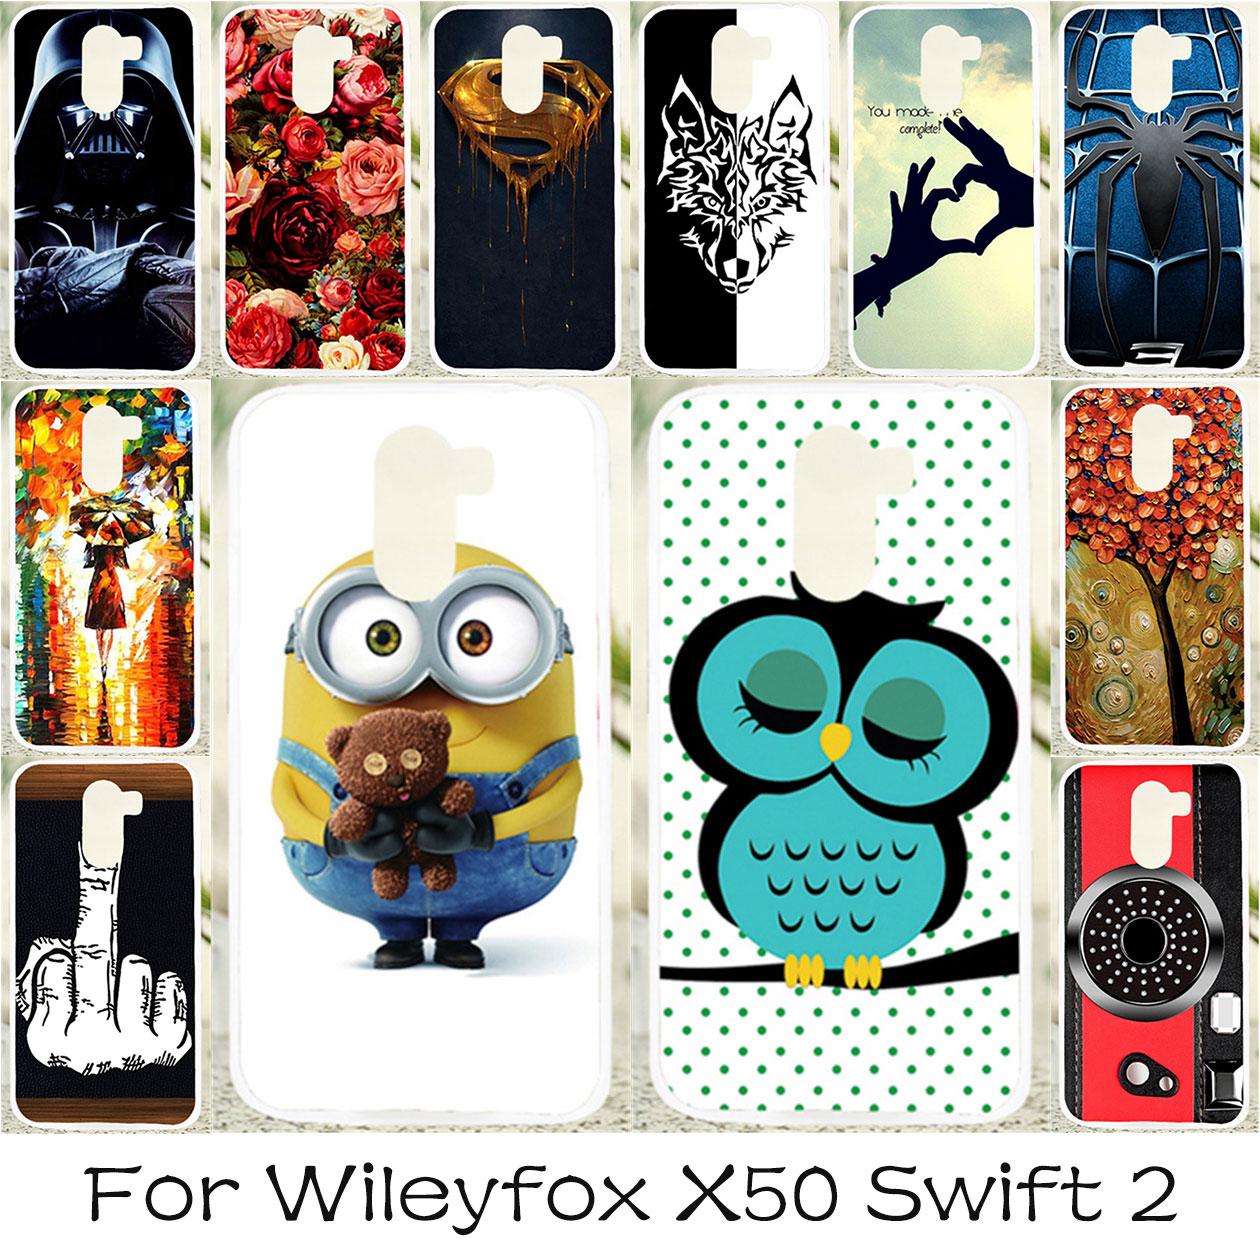 TAOYUNXI Soft TPU Phone Case For Wileyfox Swift 2 Cases . d06d2e493aac